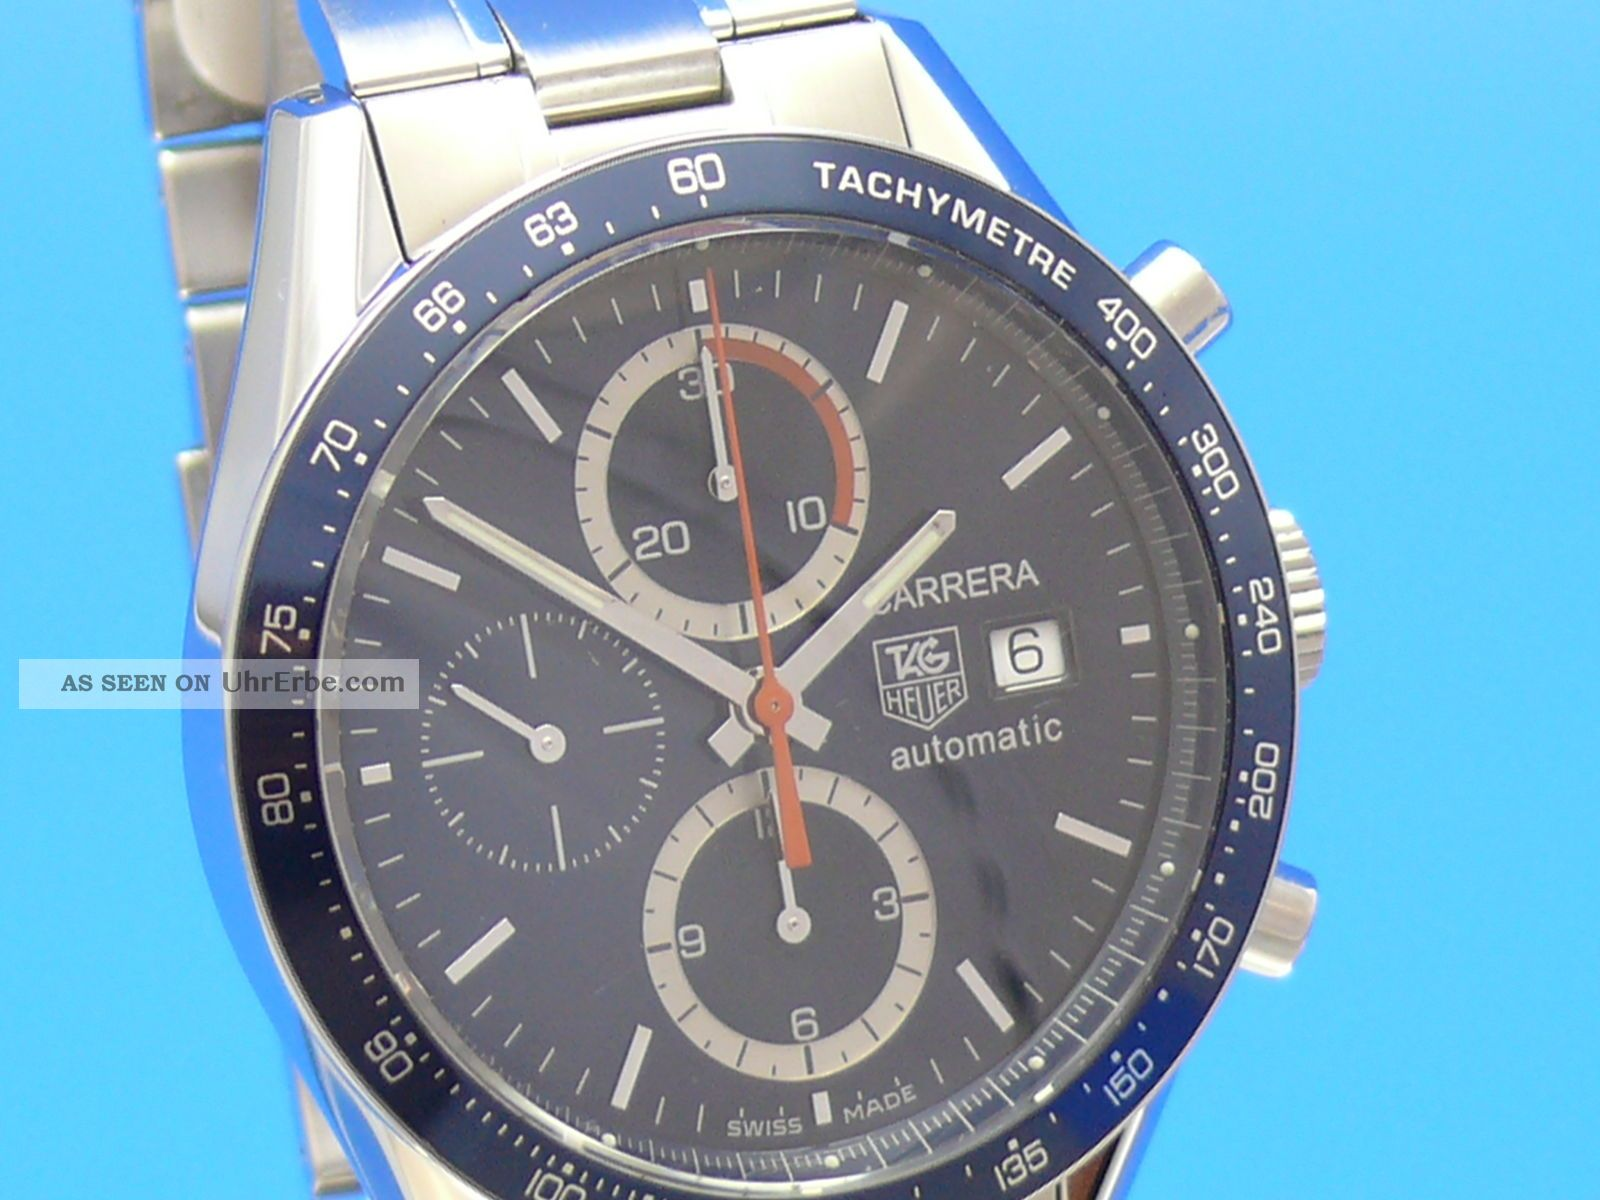 Tag Heuer Carrera Date Chronograph Cv2015 Blau Vom Uhrencenter Berlin Armbanduhren Bild